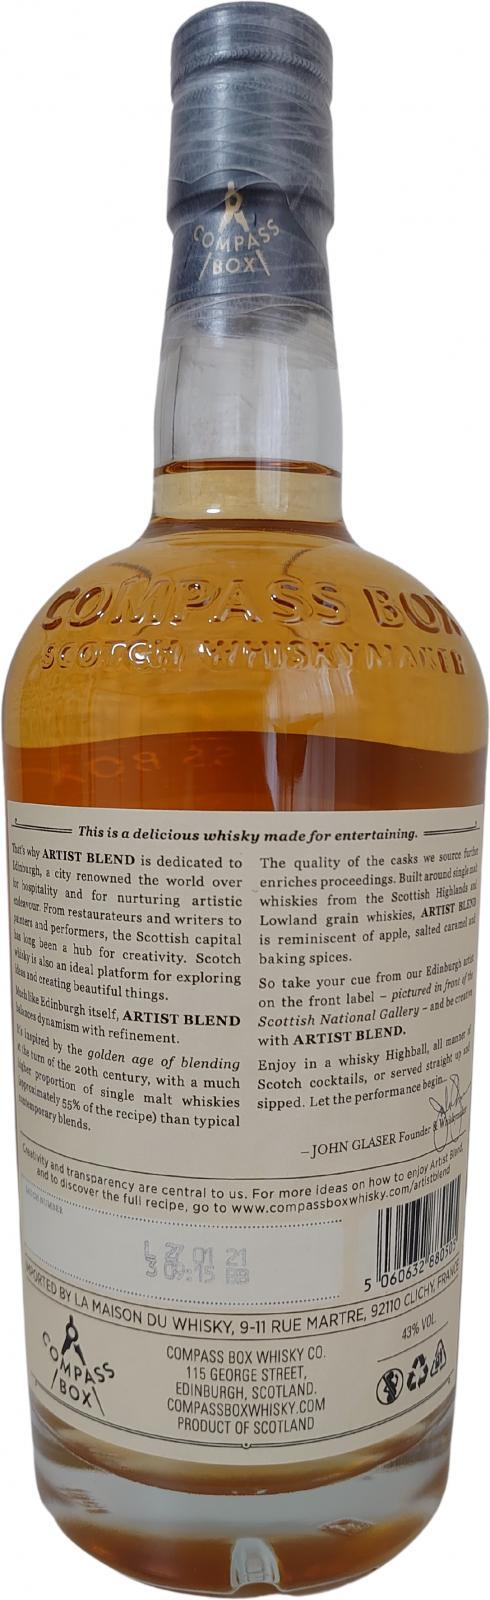 Artist Blend Scotch Whisky